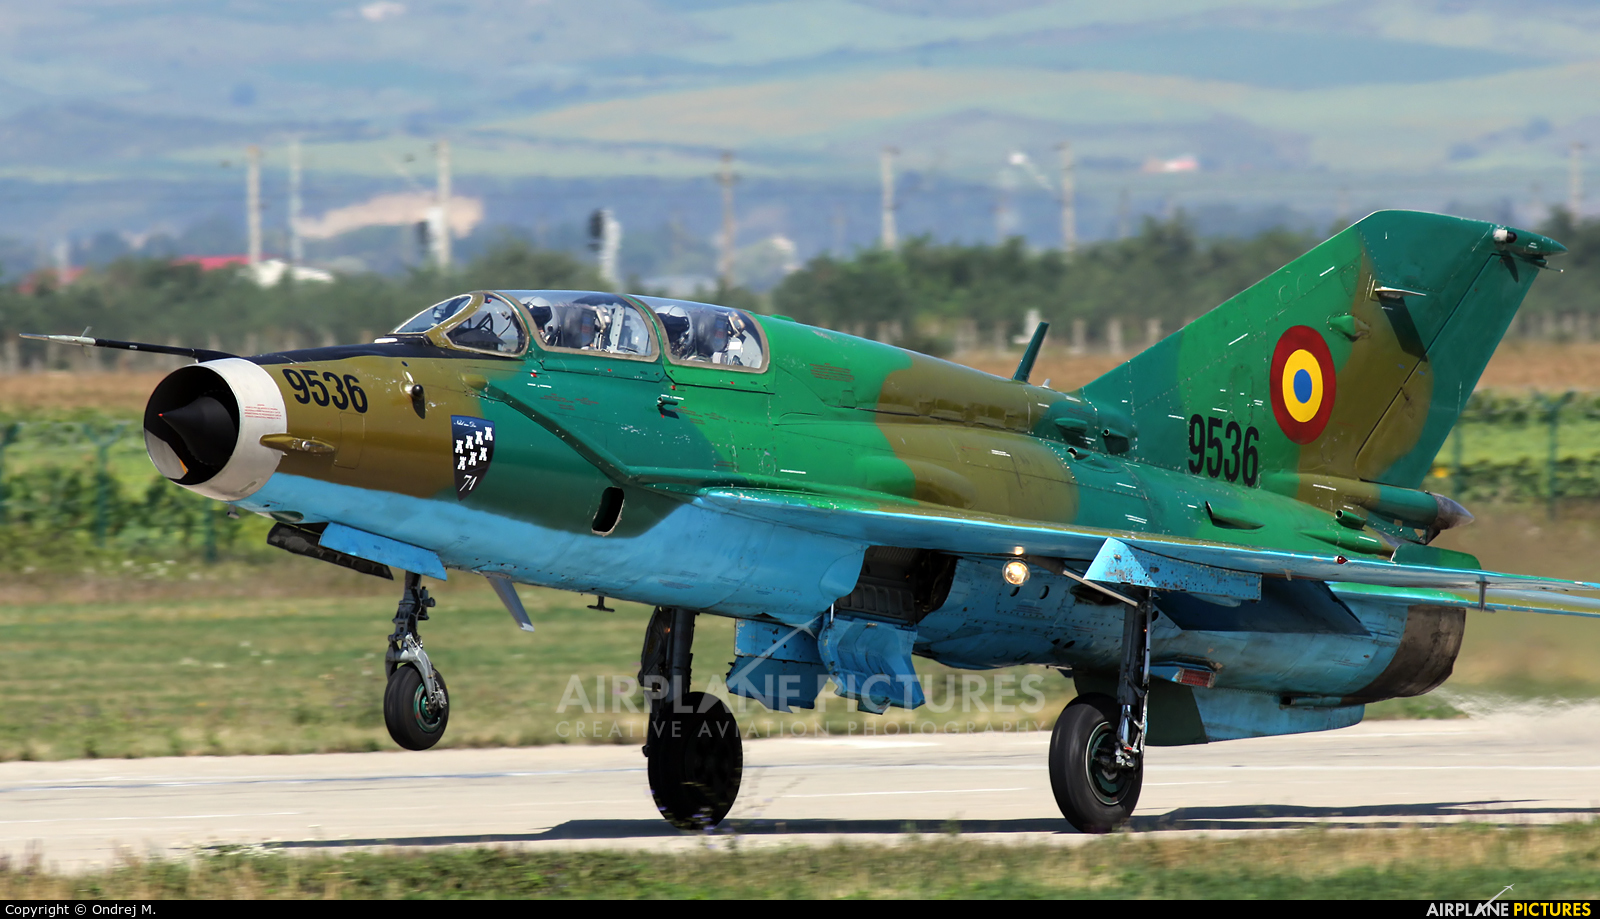 Romania - Air Force 9536 aircraft at Câmpia Turzii